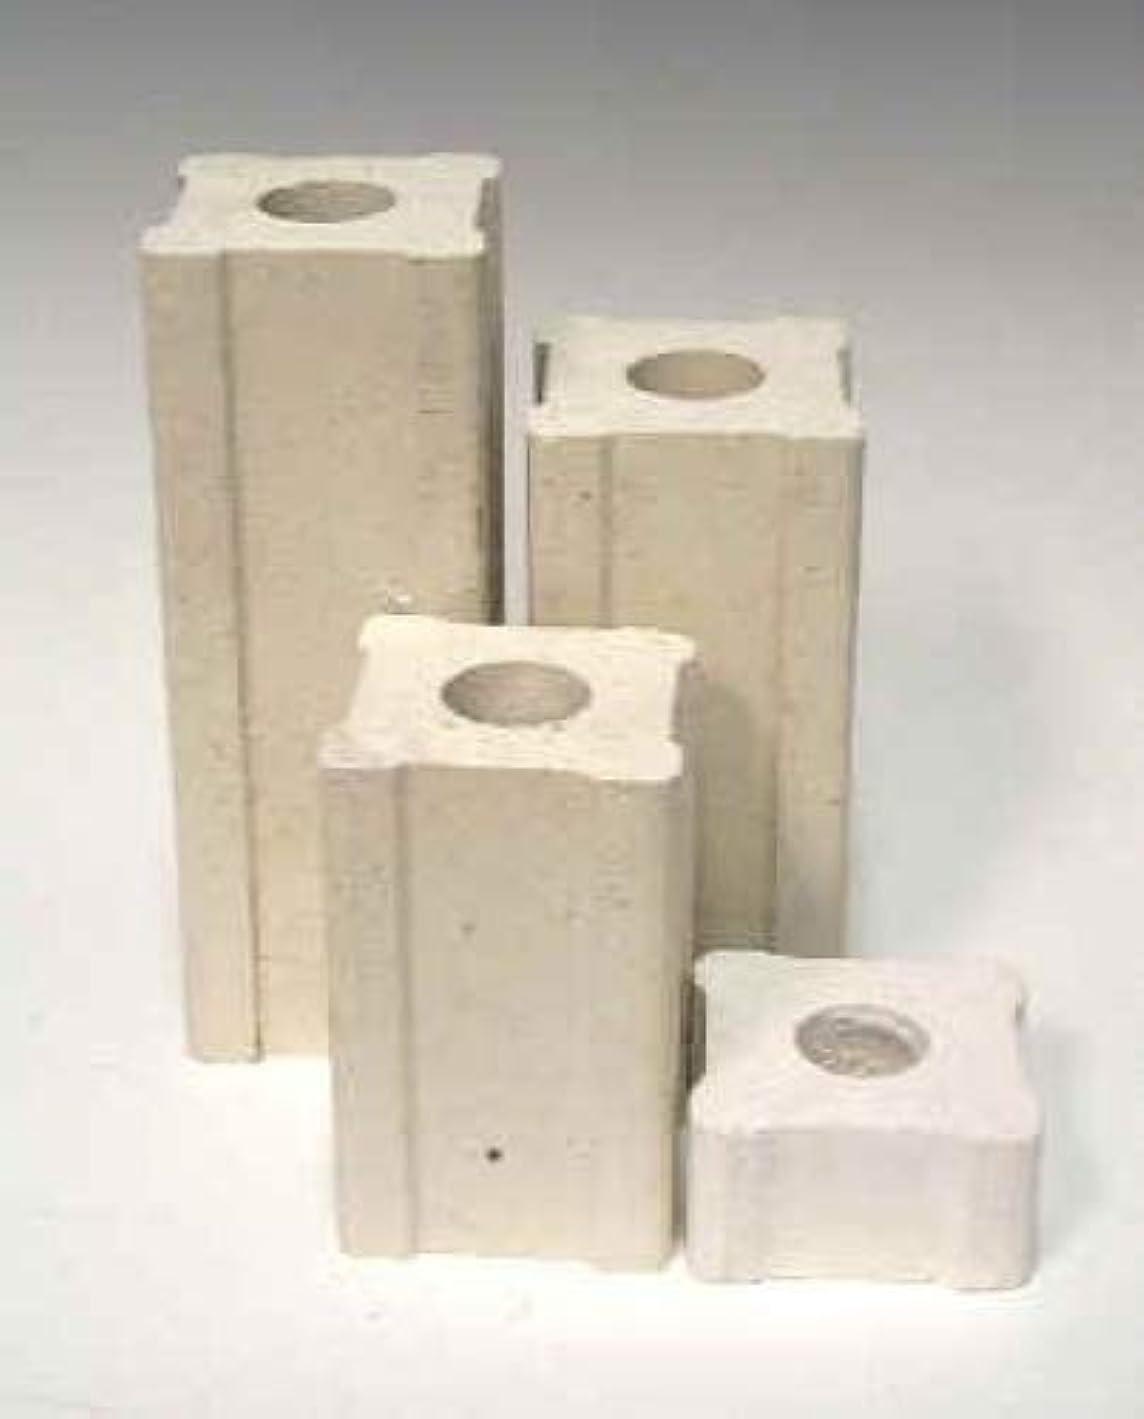 1 Inch x 1 Inch Kiln Posts - Set of 4 e91953063618566